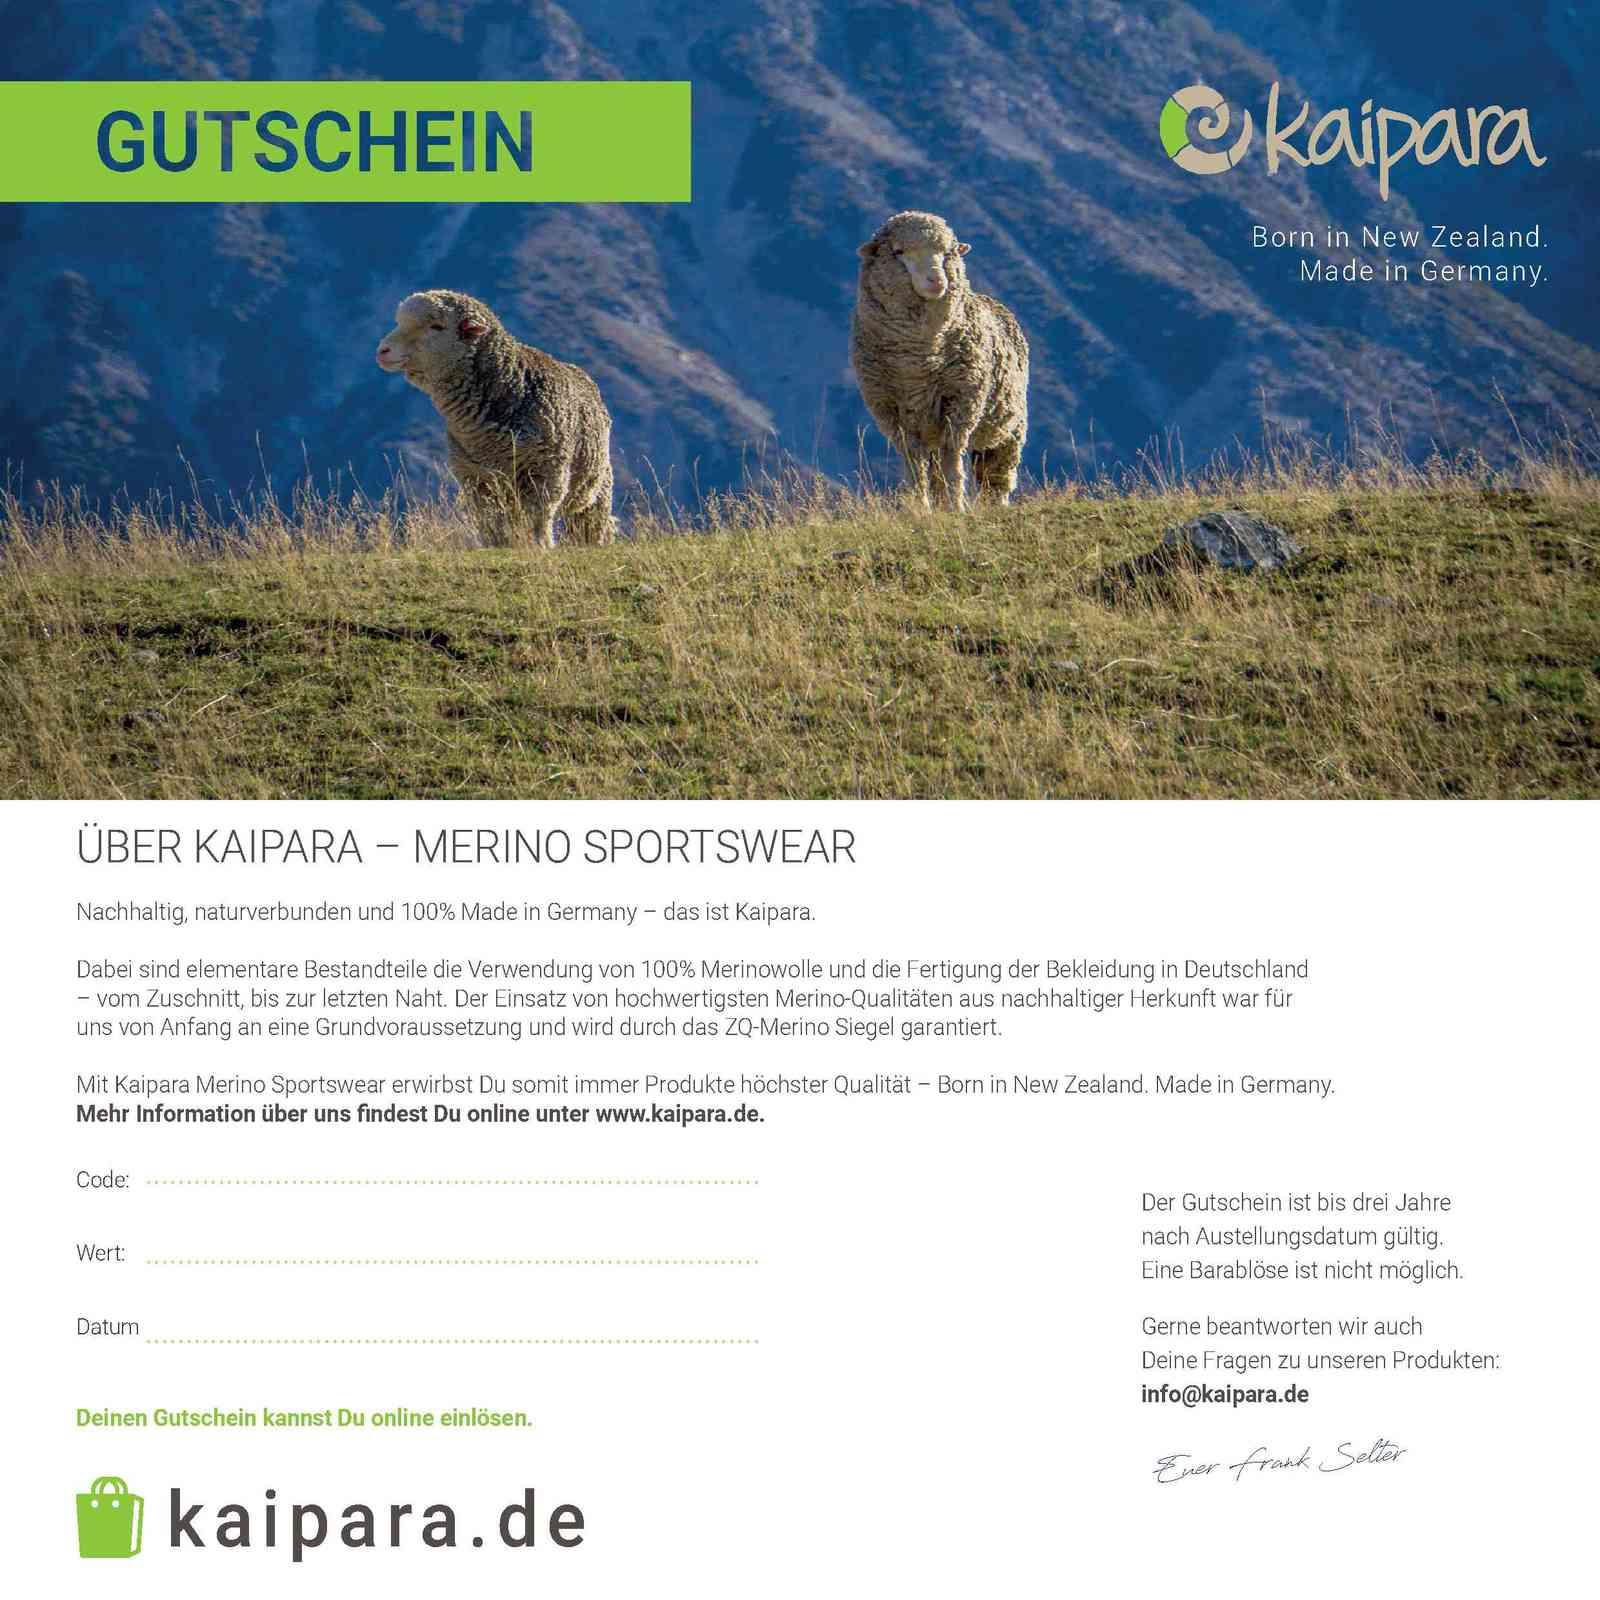 Kaipara Gutschein 200 Euro